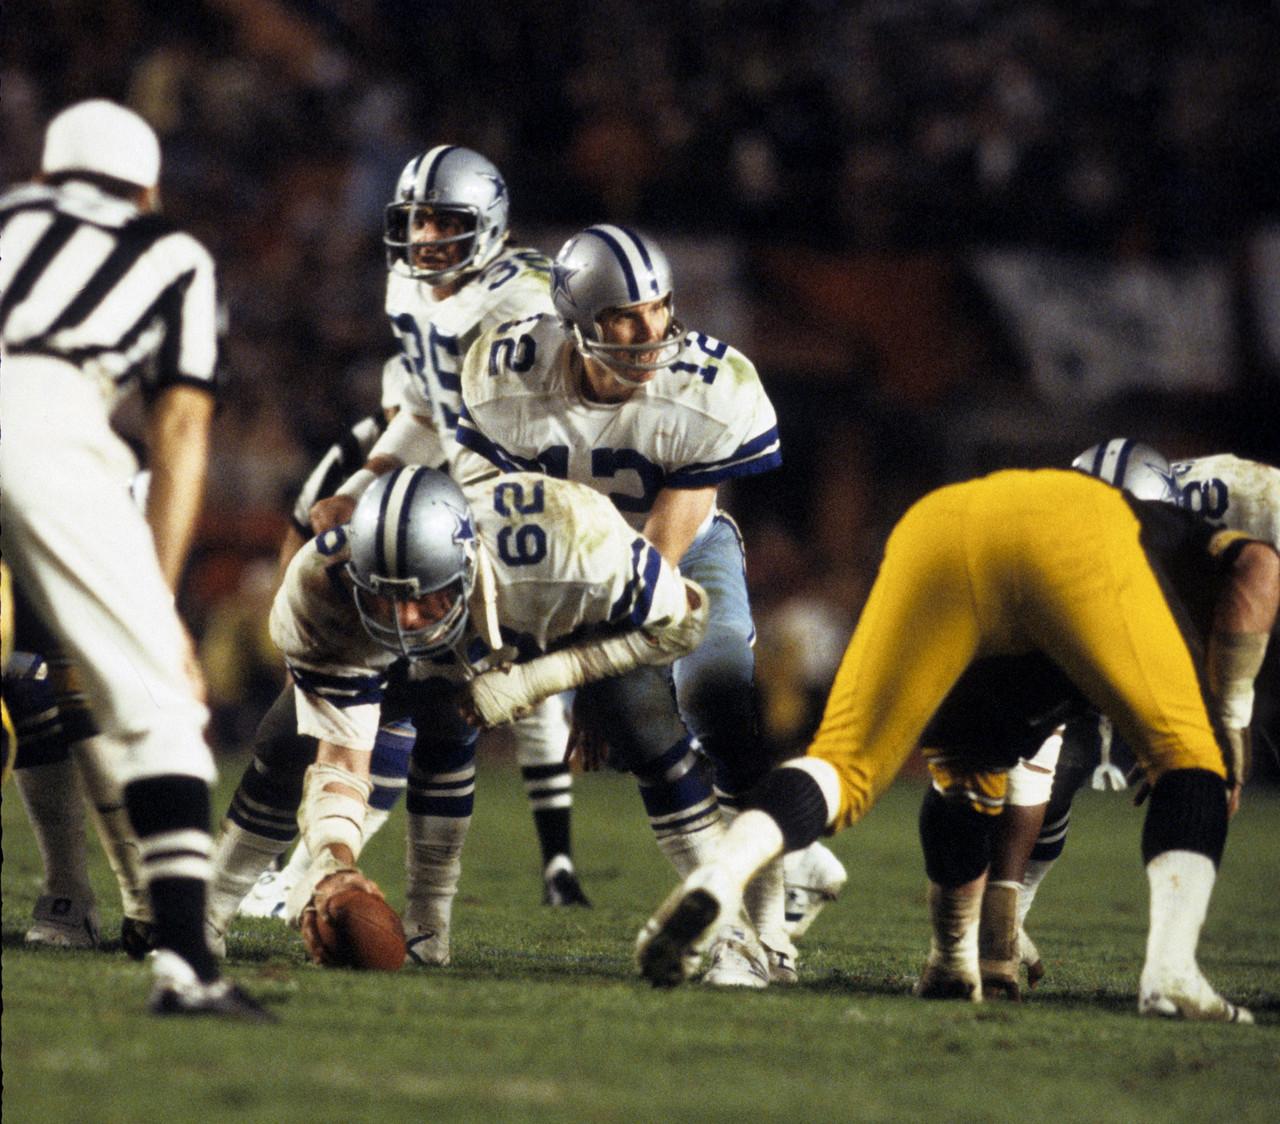 1975 Dallas Cowboys Player Rankings: #16 John Fitzgerald